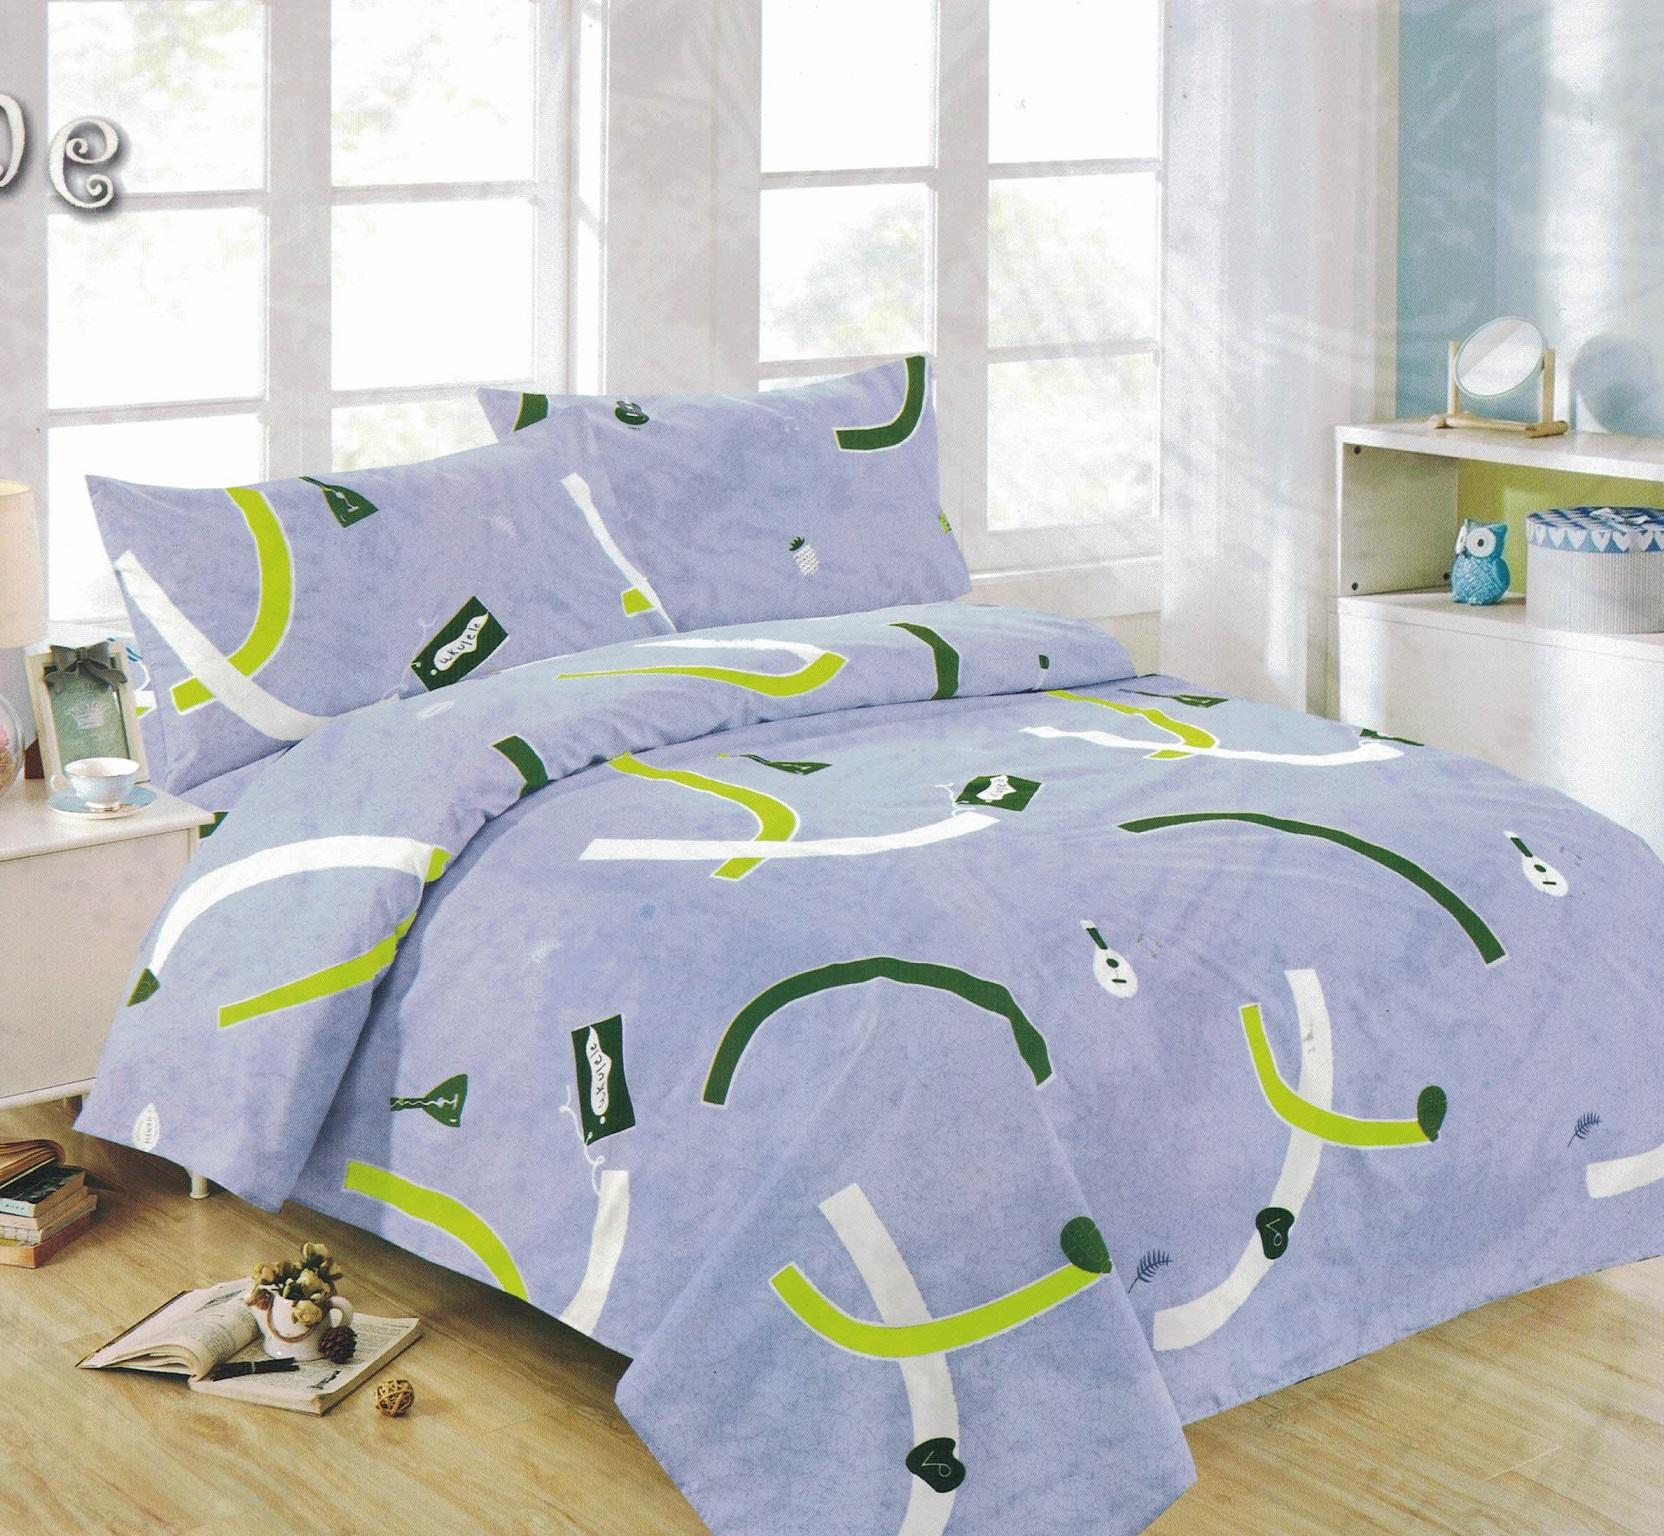 Superb Bedtime Bedsheet Single Size 3 Piece Set